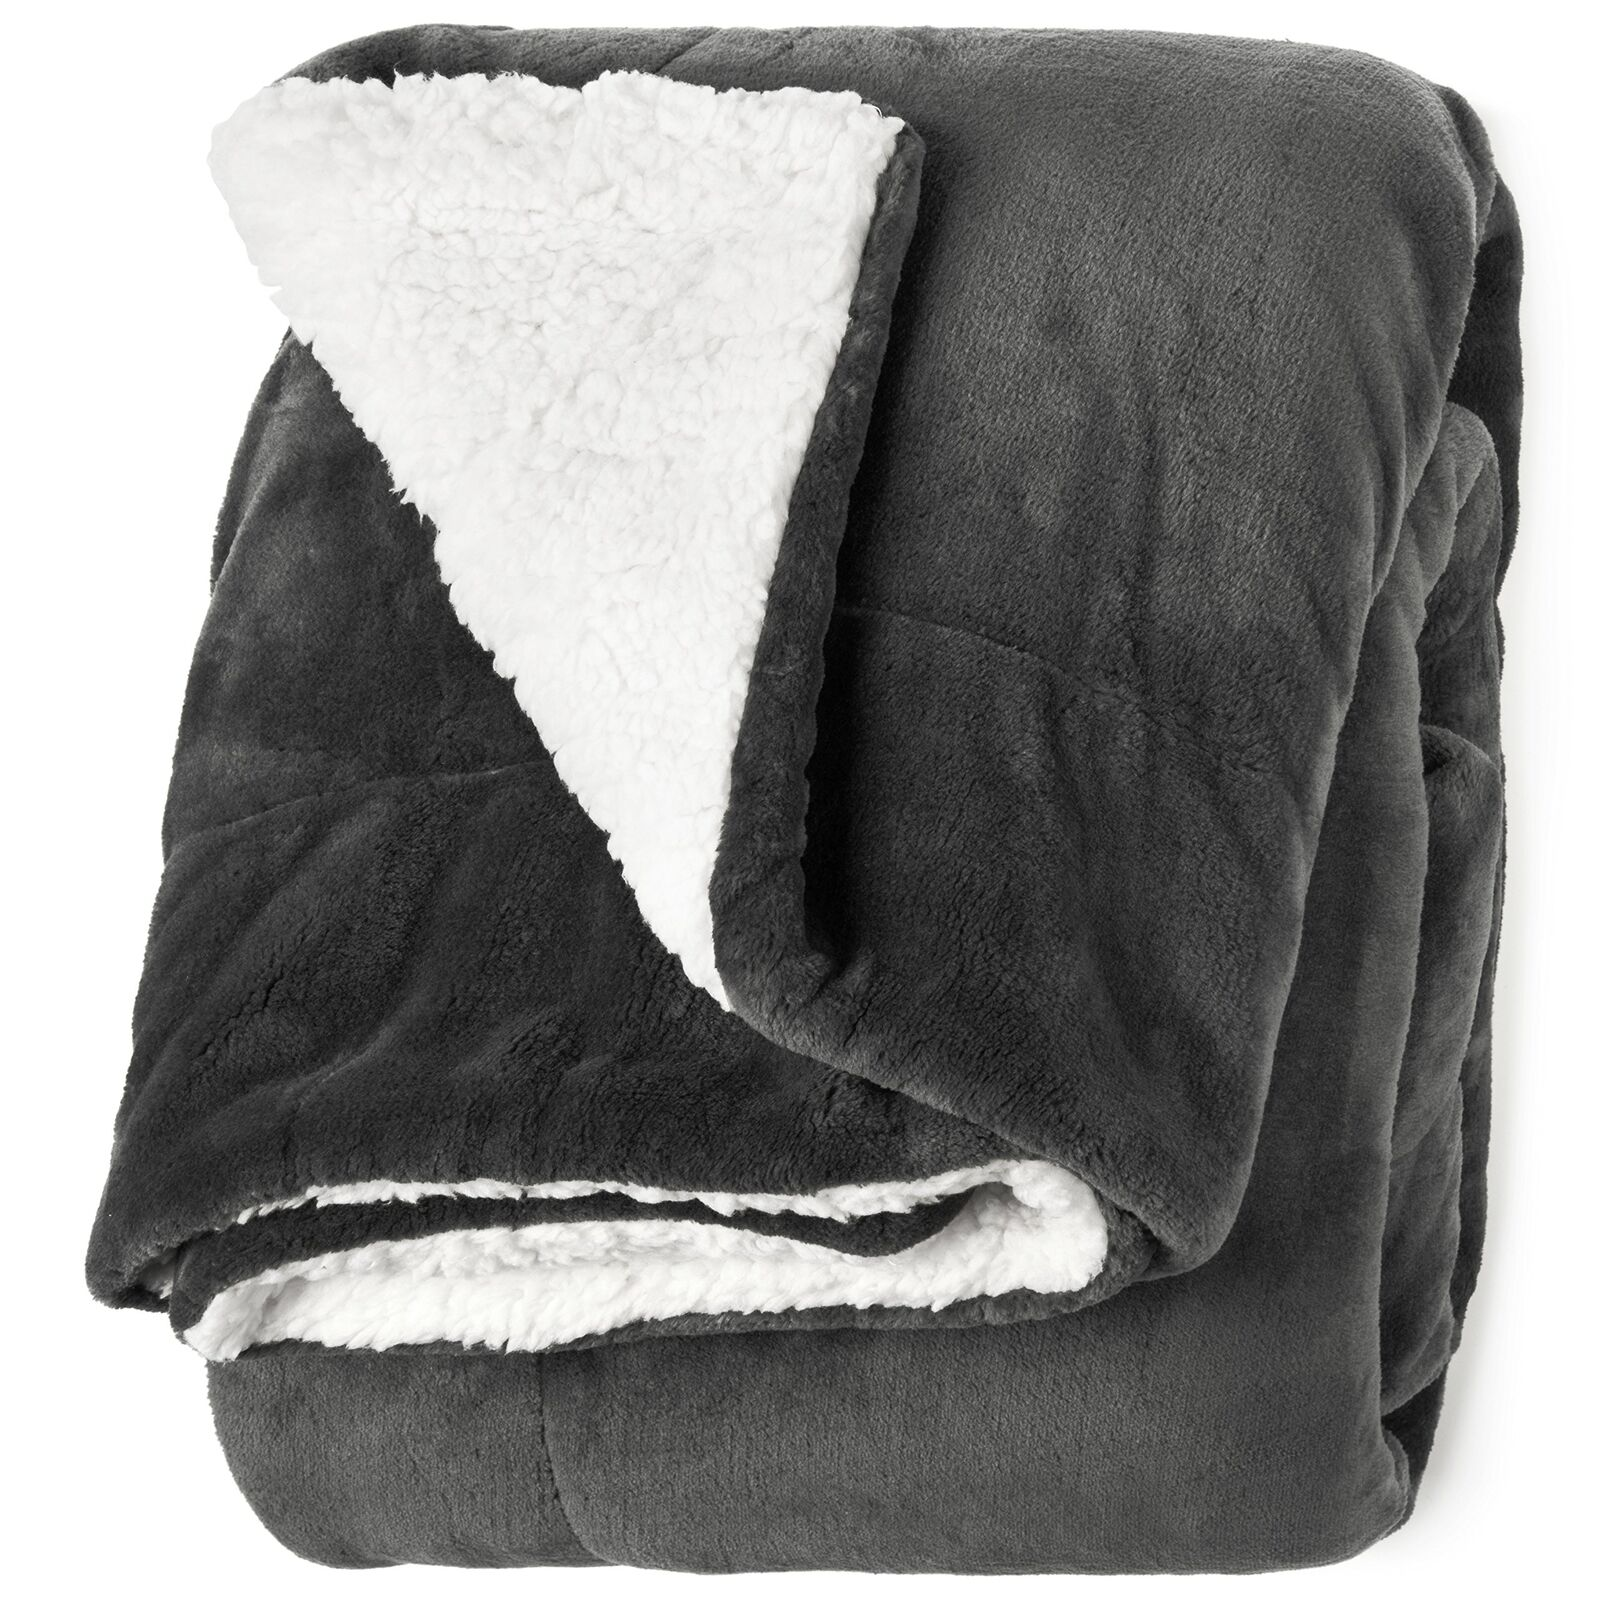 "Life Comfort Microfiber Plush Polyester 60""x70"" Large All Season Blanket for"